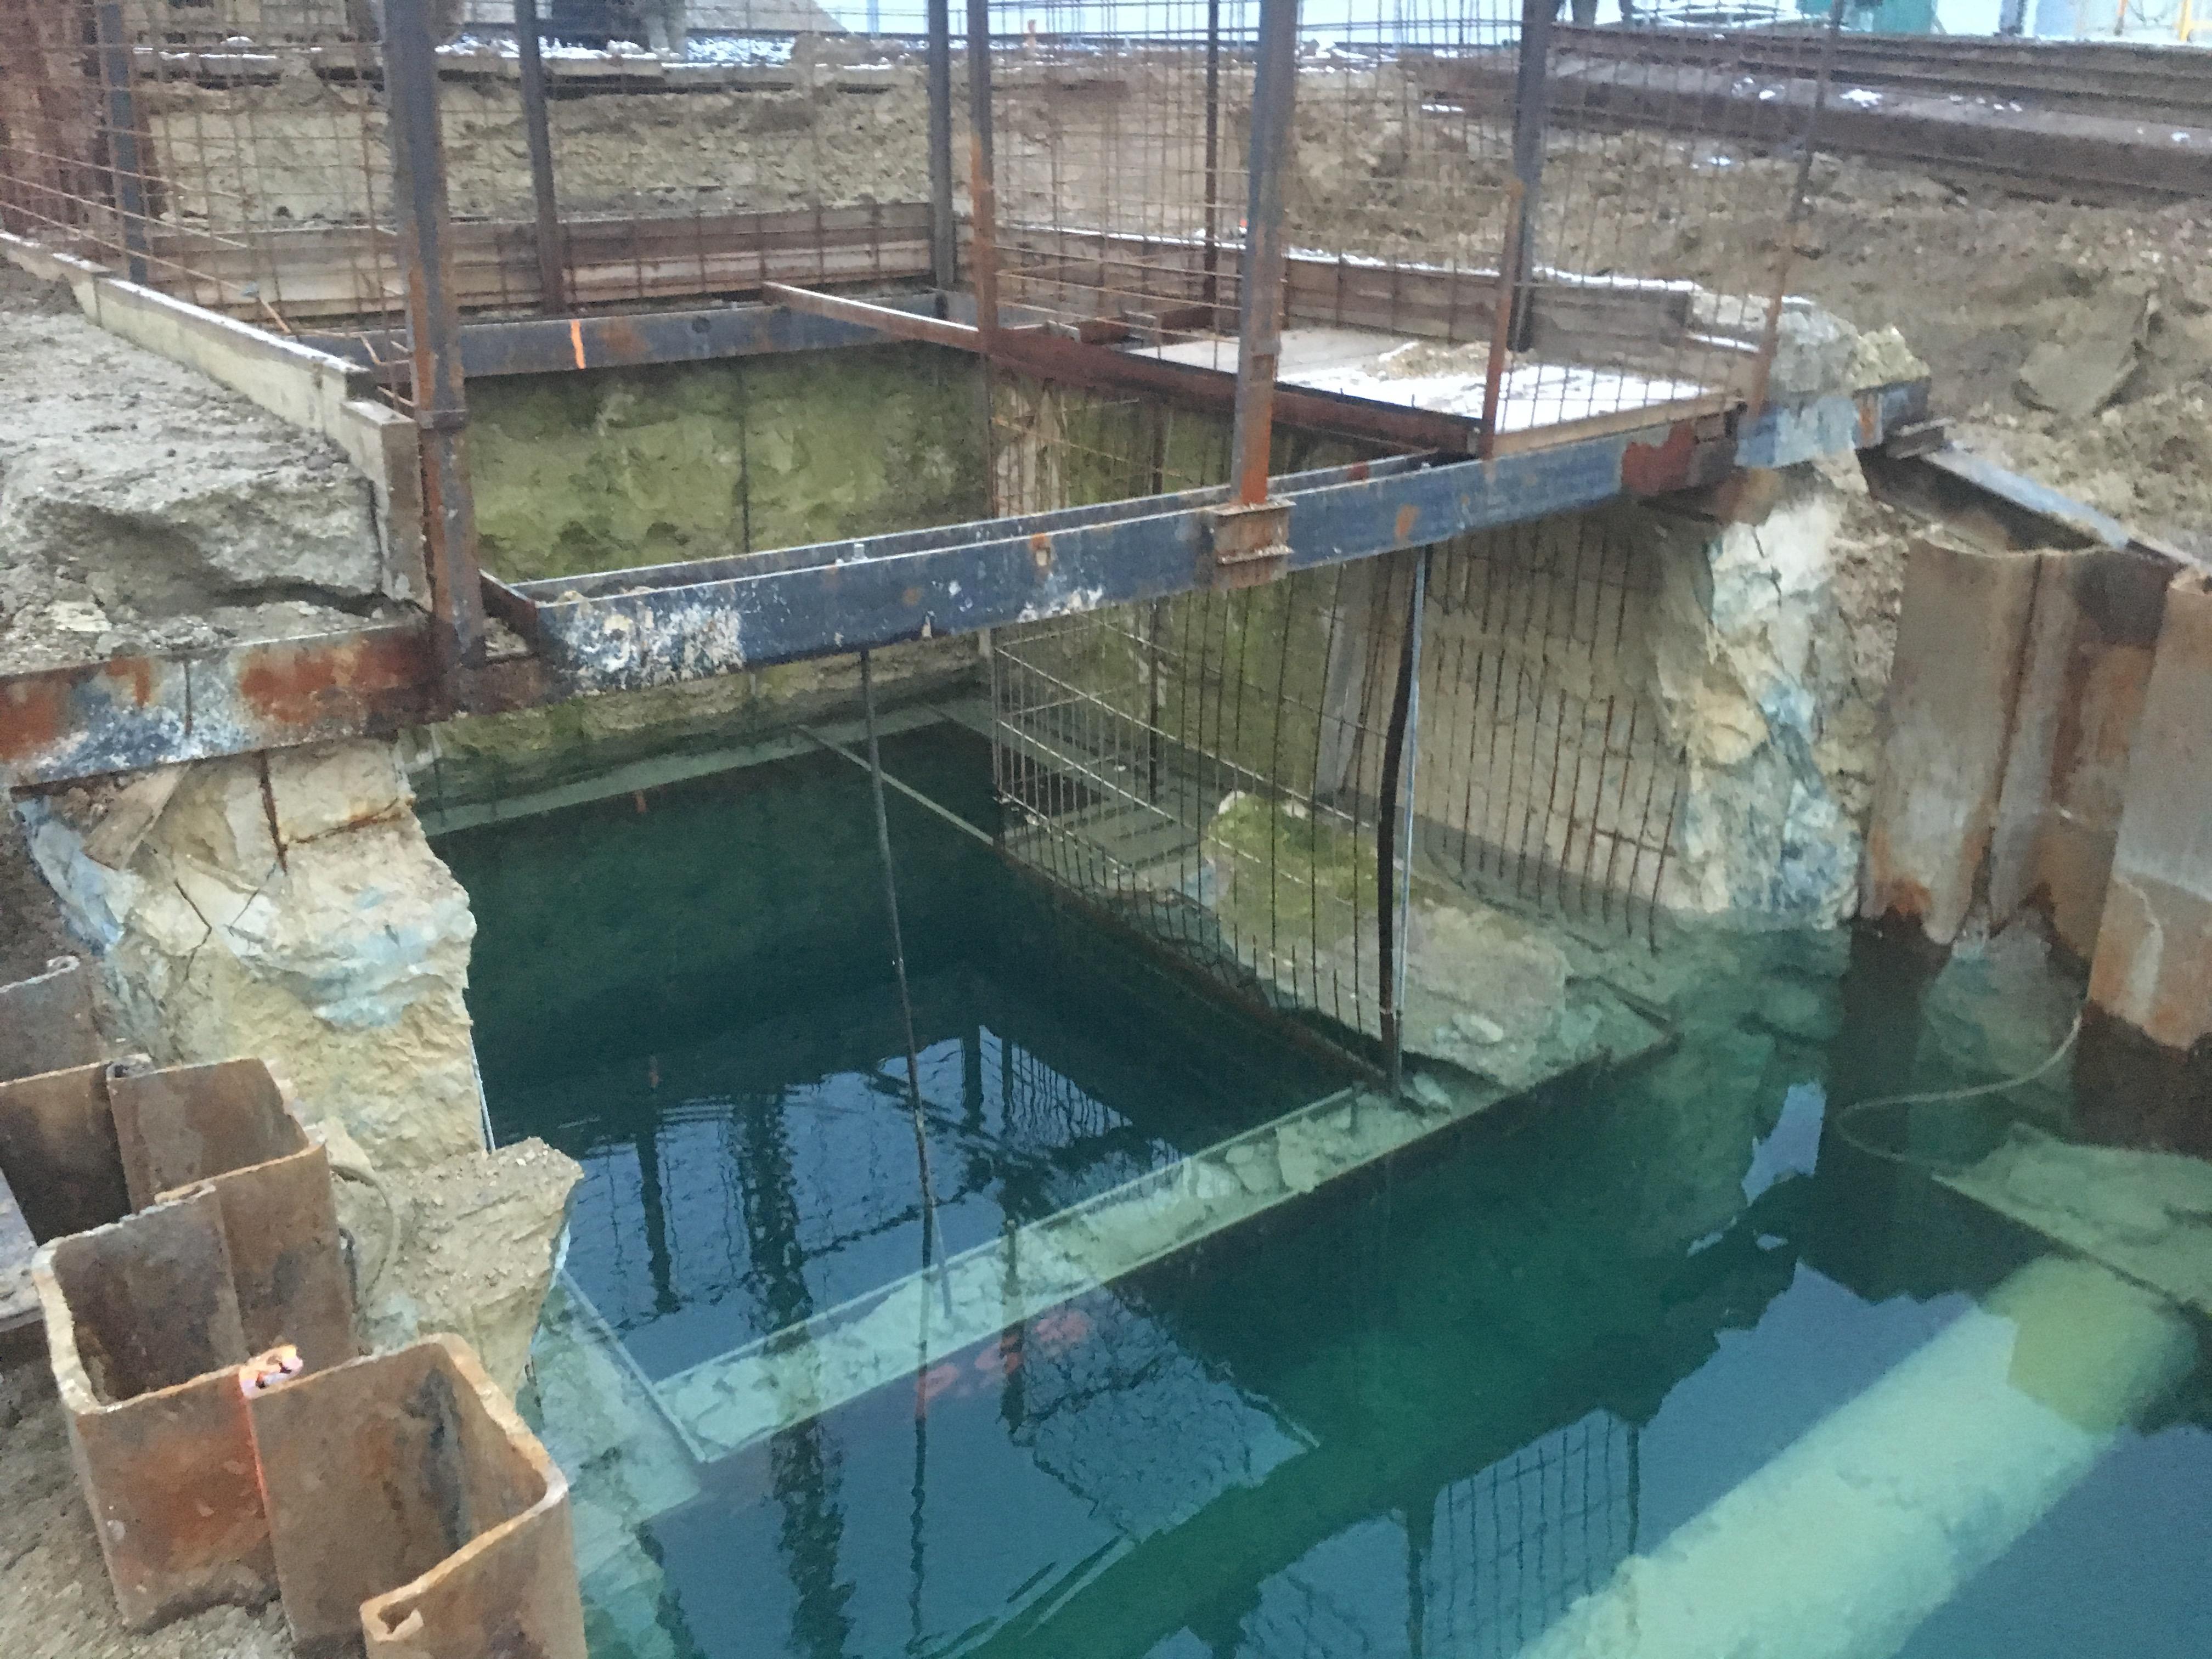 Drill pit GRT de France